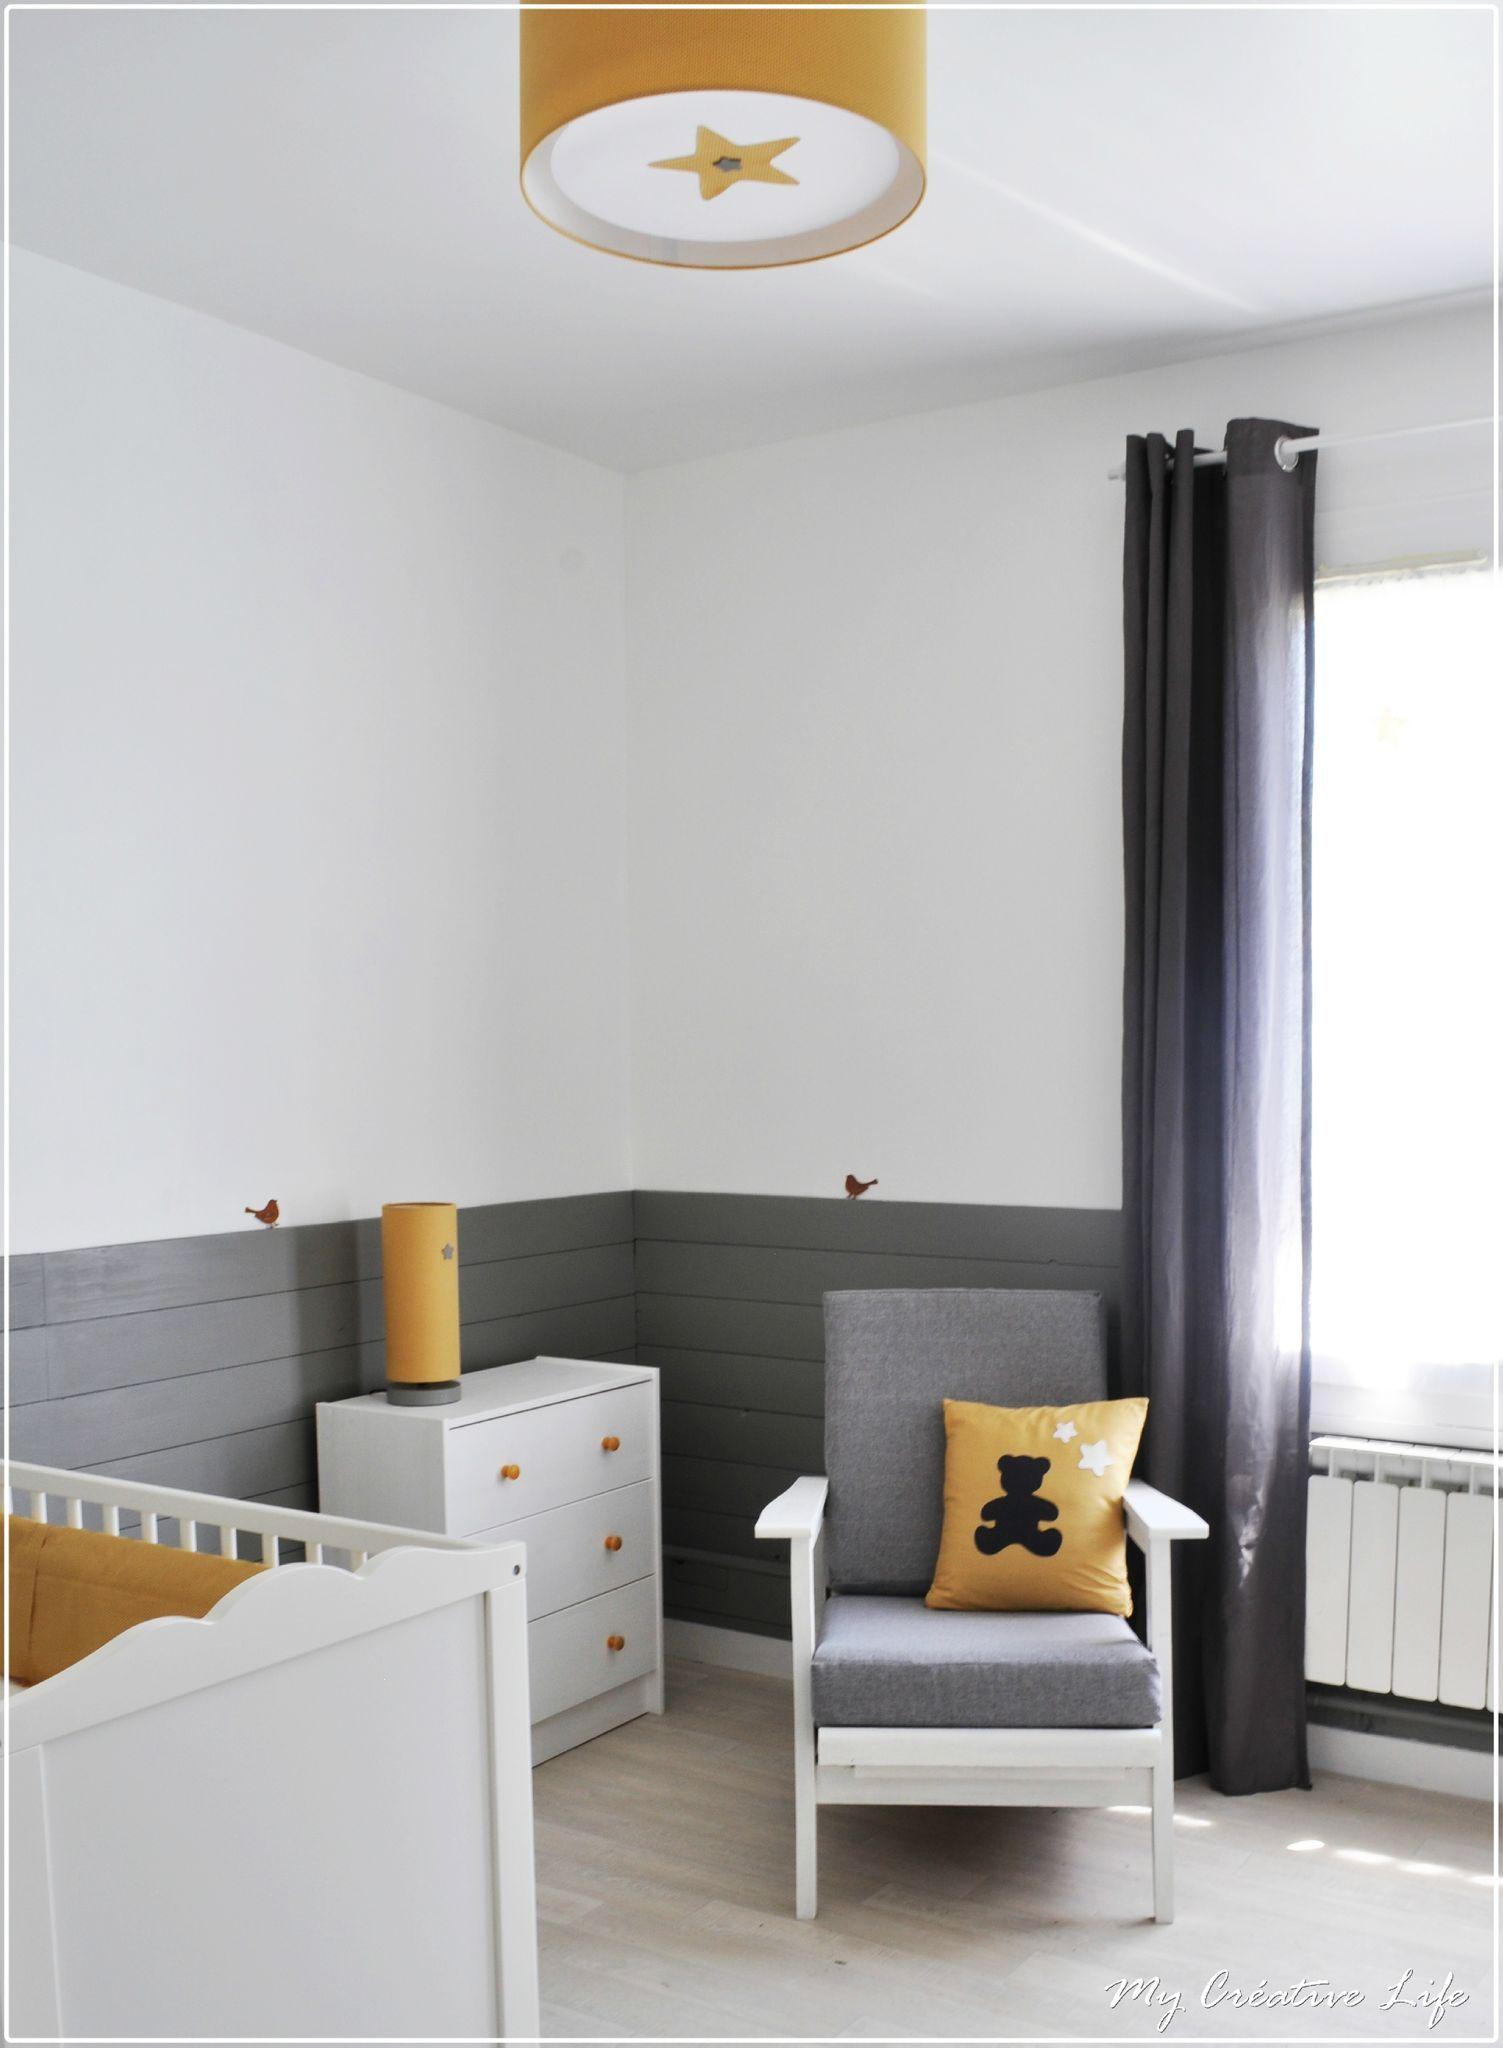 Chambre bébé, gris, jaune et blanc (baby room / nursery) | NURSERY ...